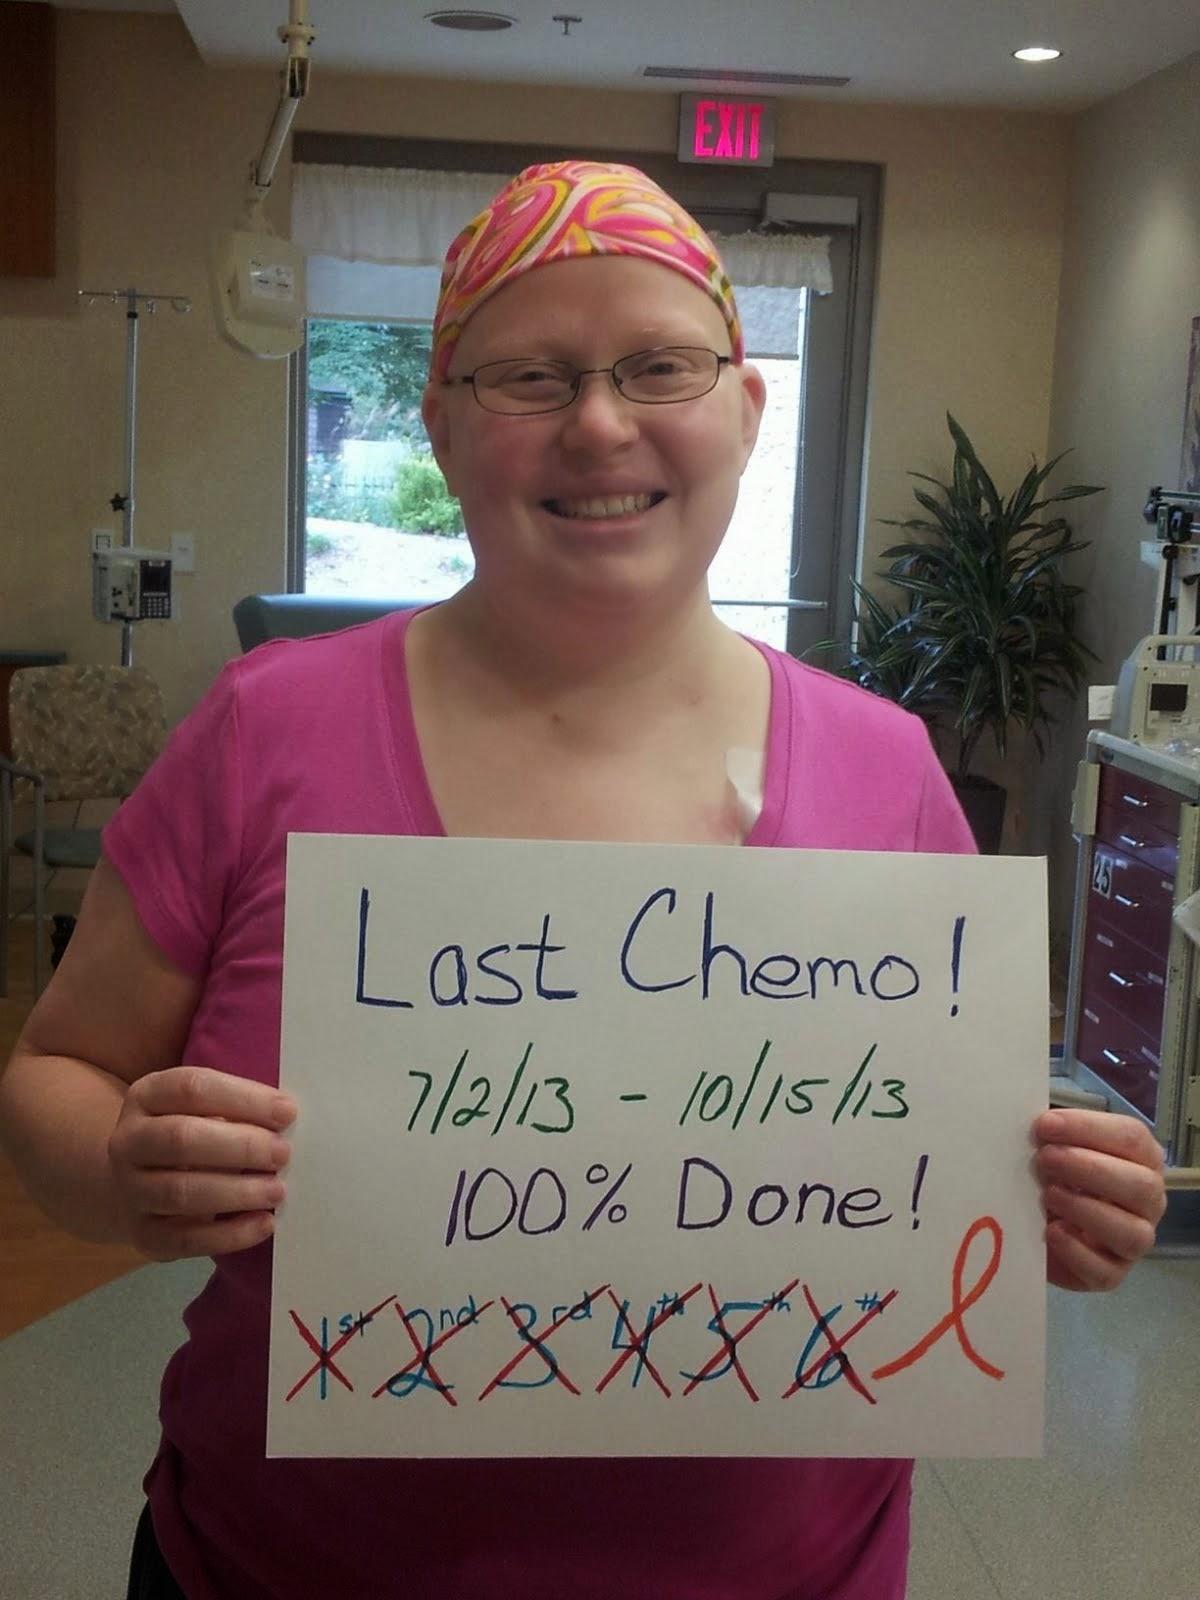 Last Chemo